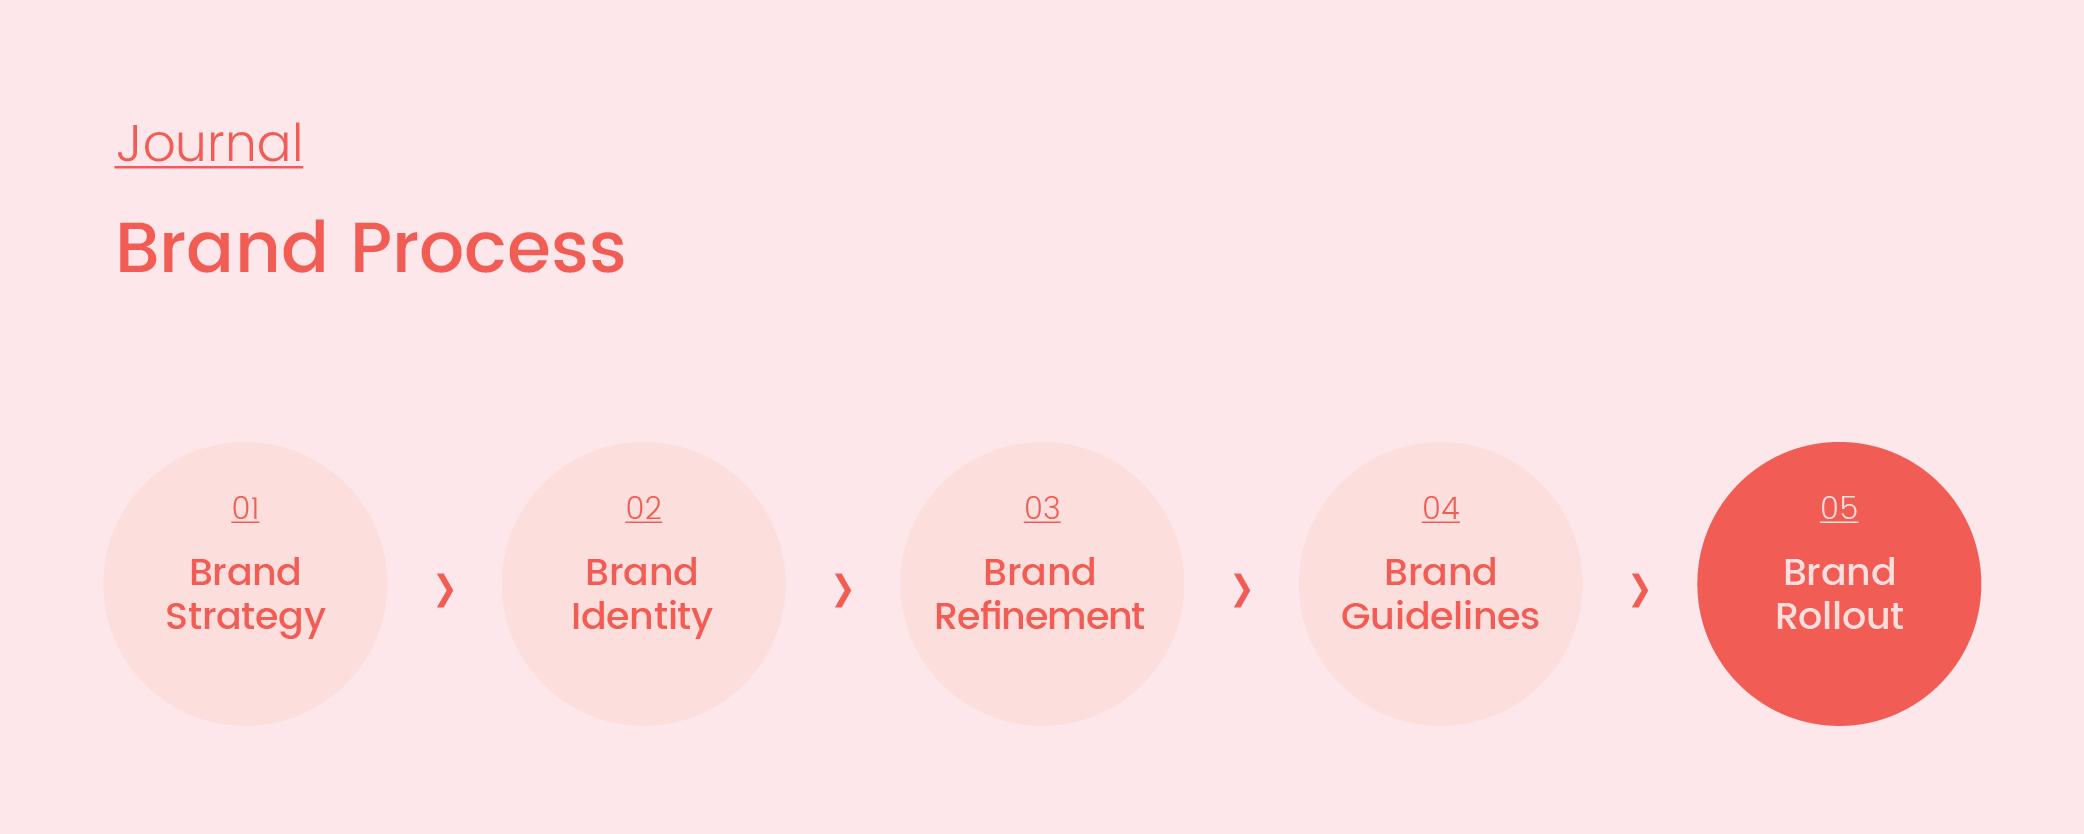 Brand Process_05_Rollout_Artboard 1 copy 3.png